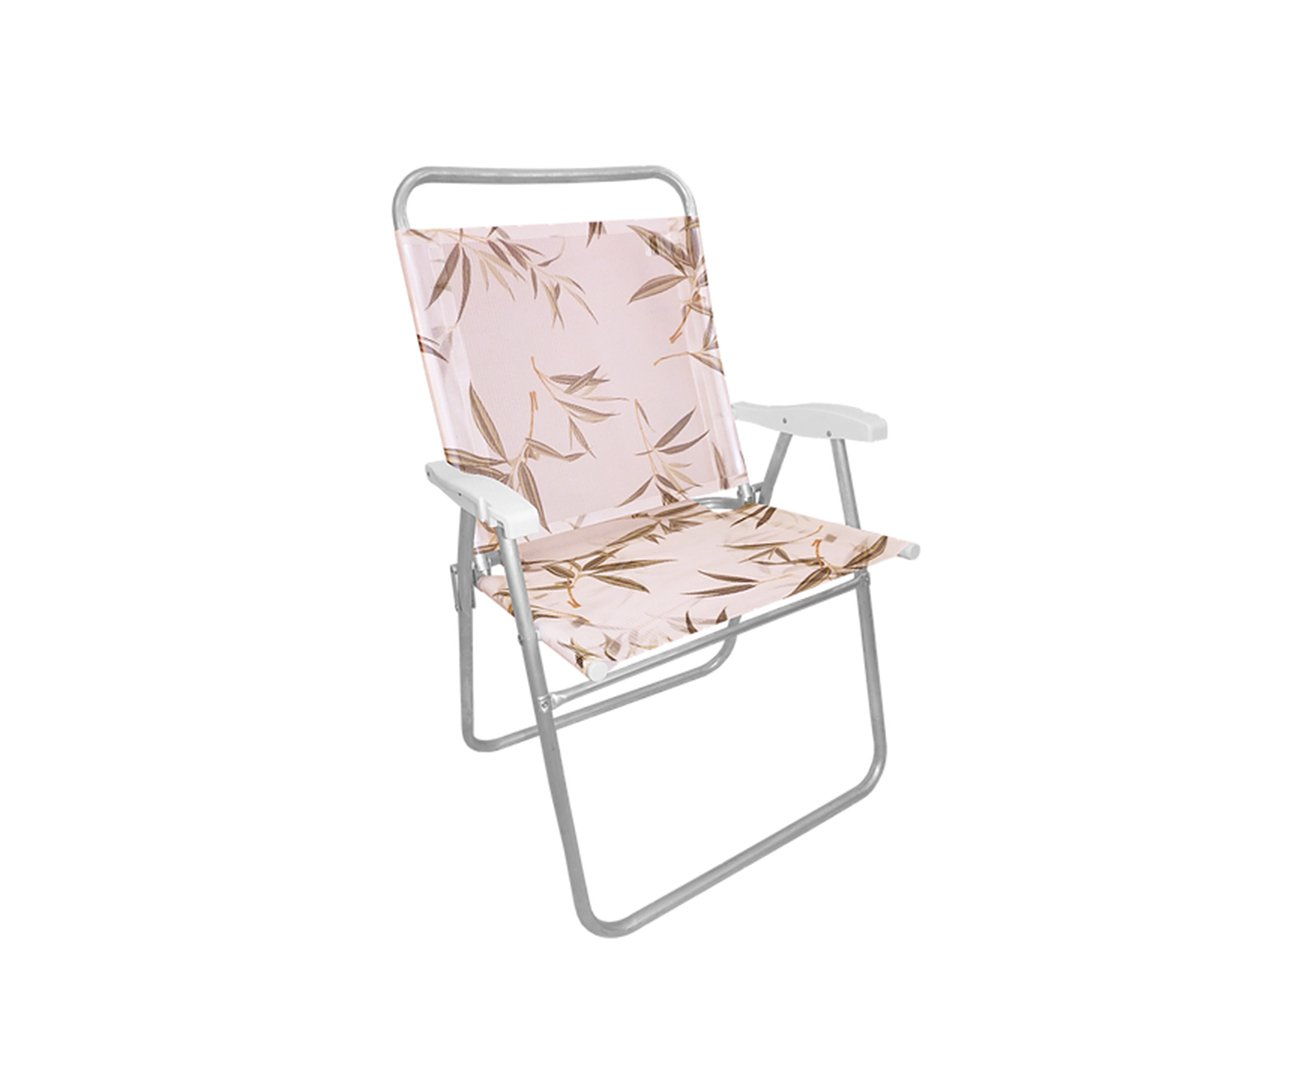 Cadeira De Praia Em Aluminio Zaka King Estampa Bambu Capacidade 140kg